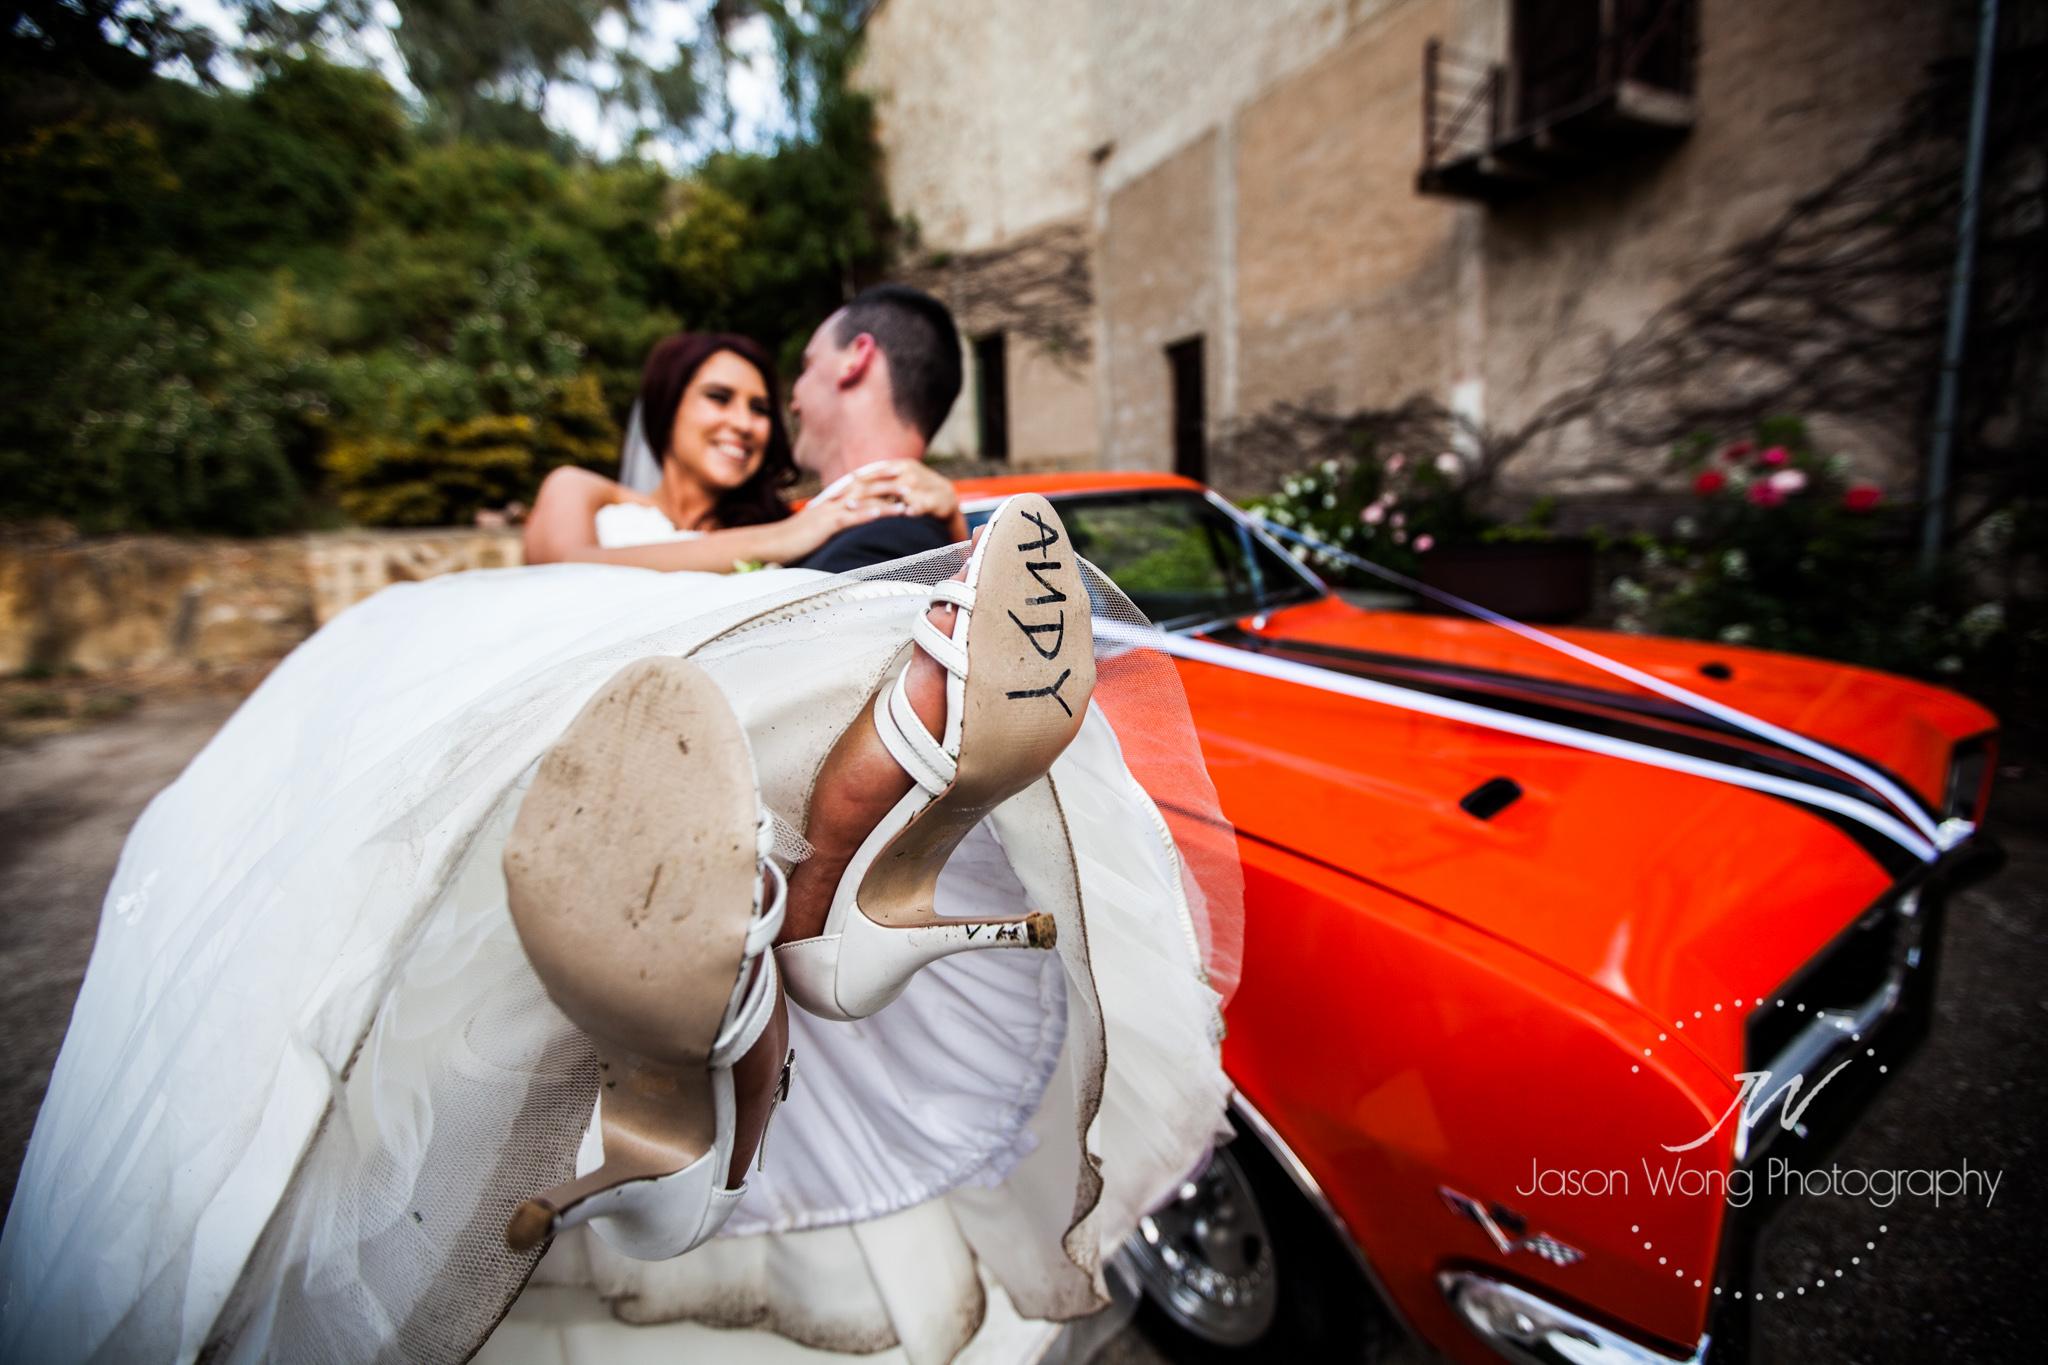 toy-story-wedding-shoot.jpg